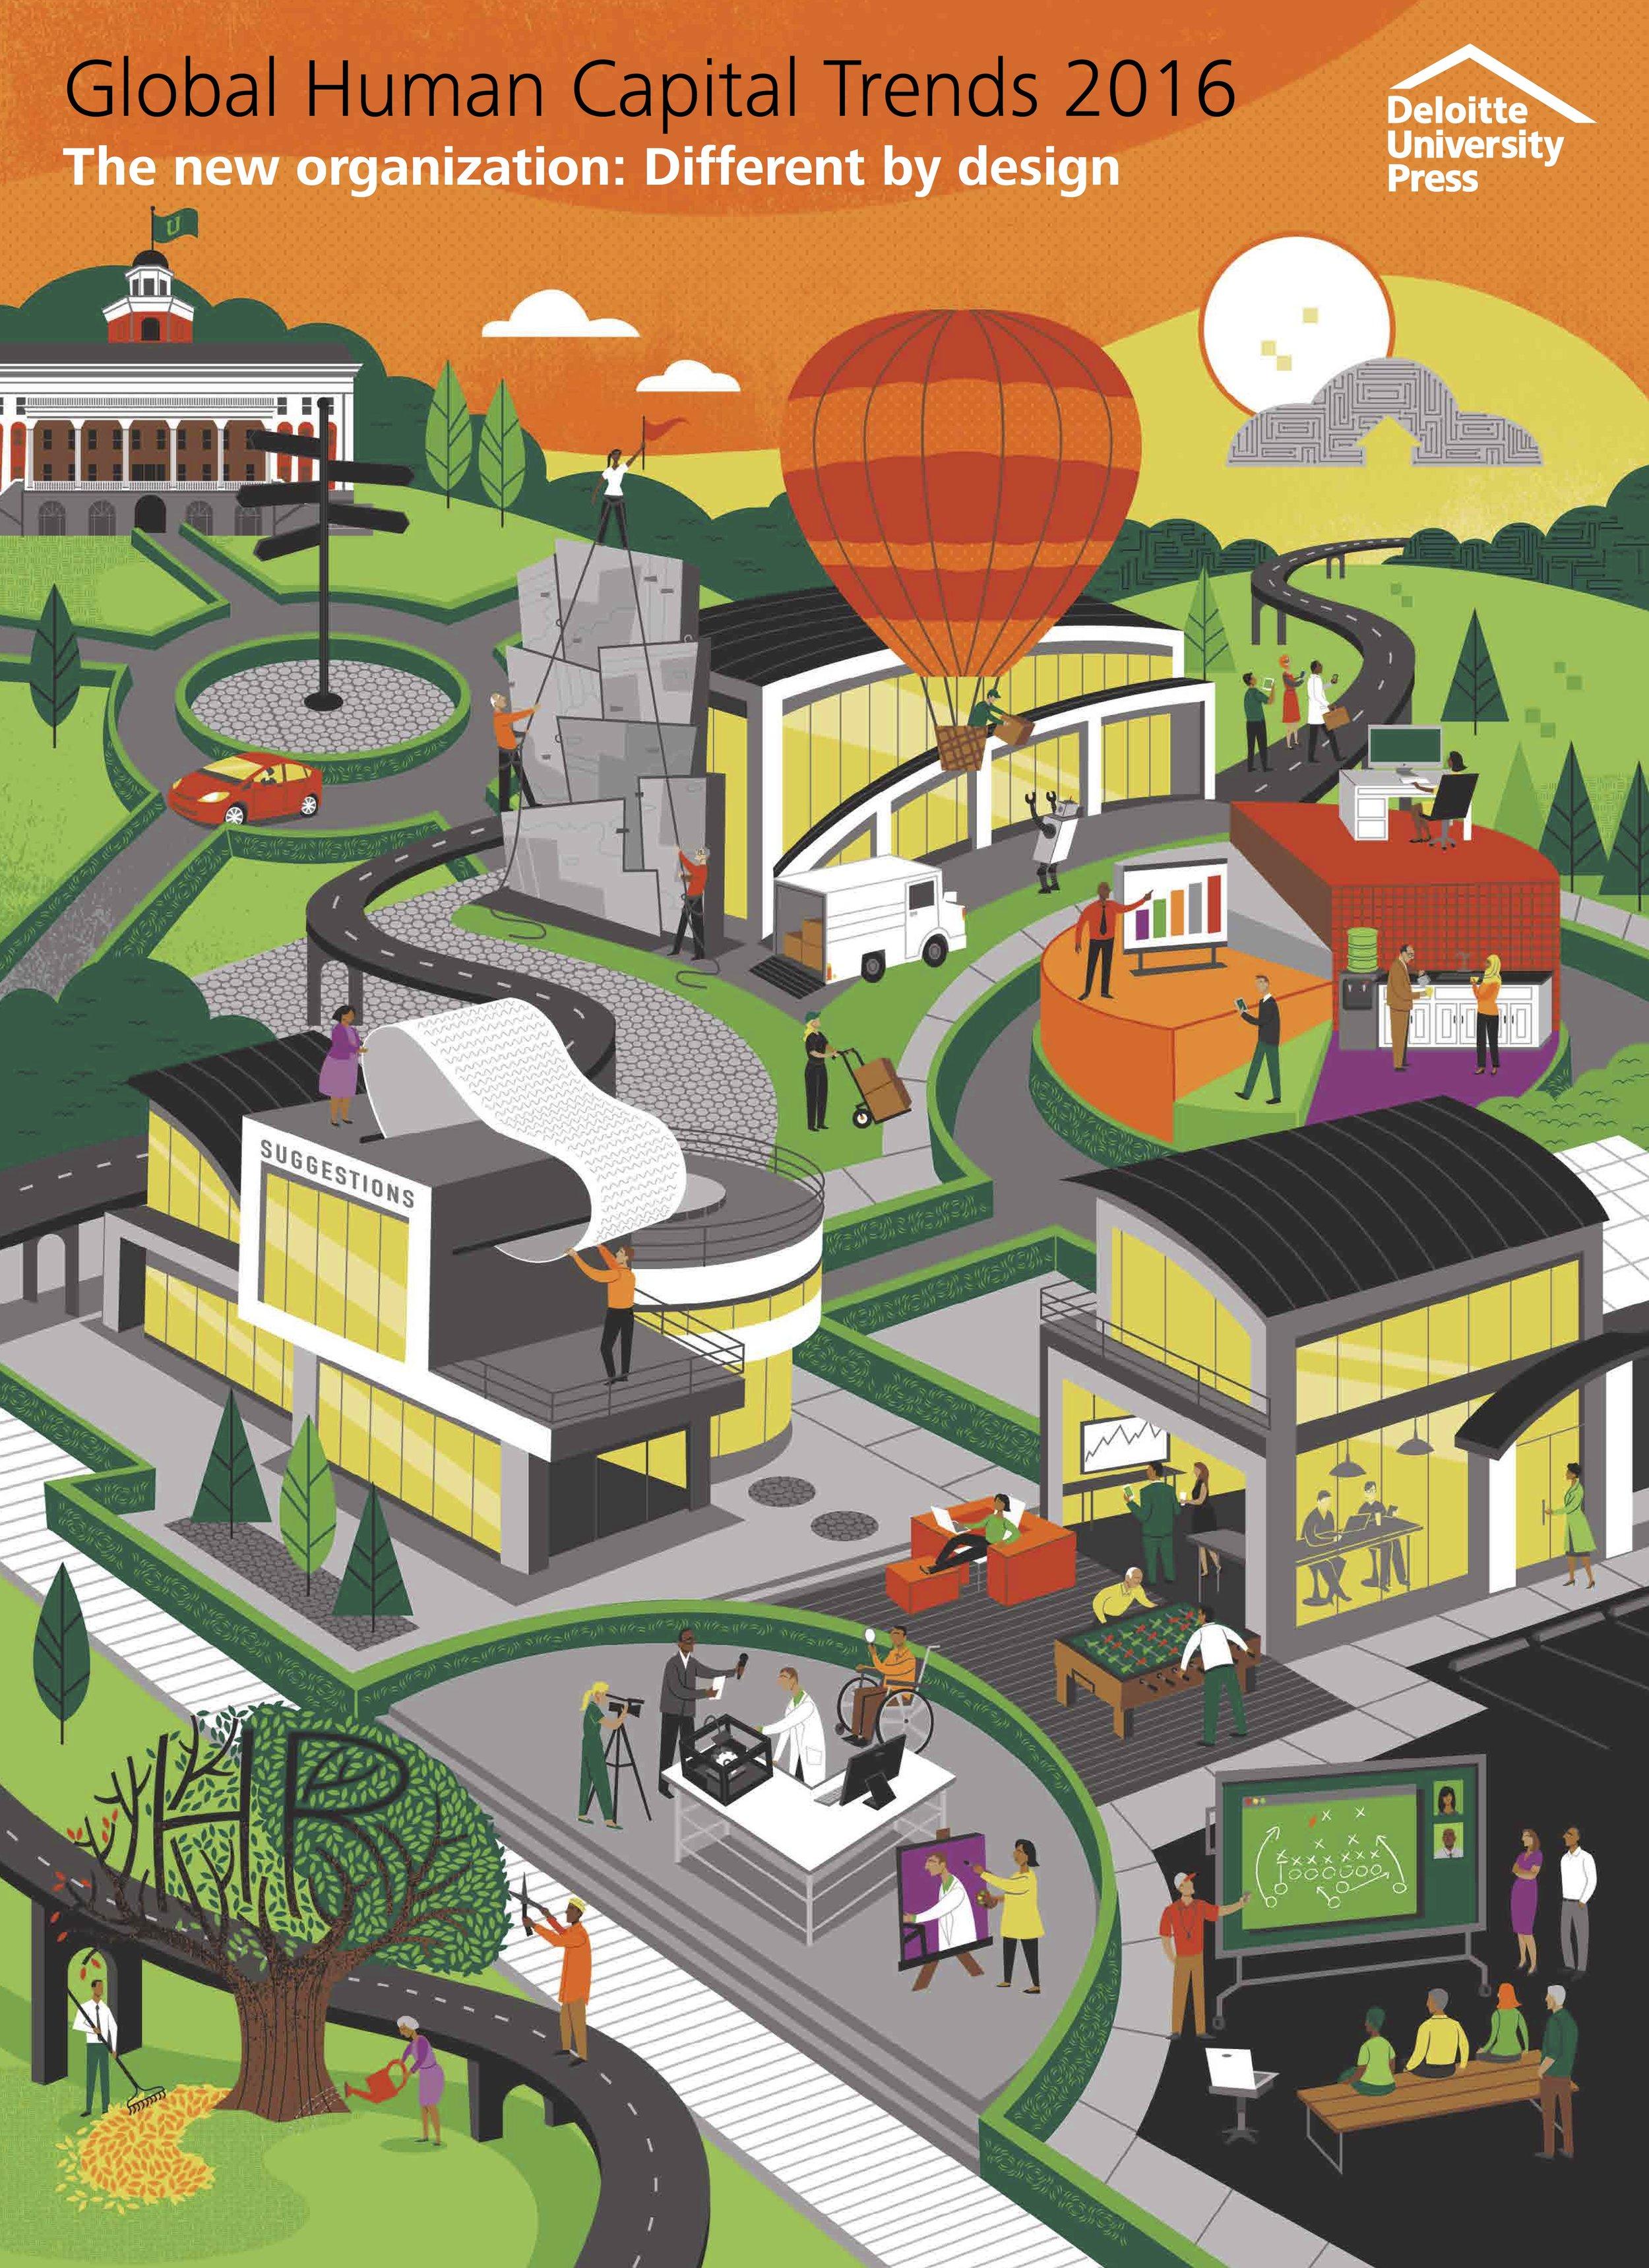 Human Capital Trends 2016